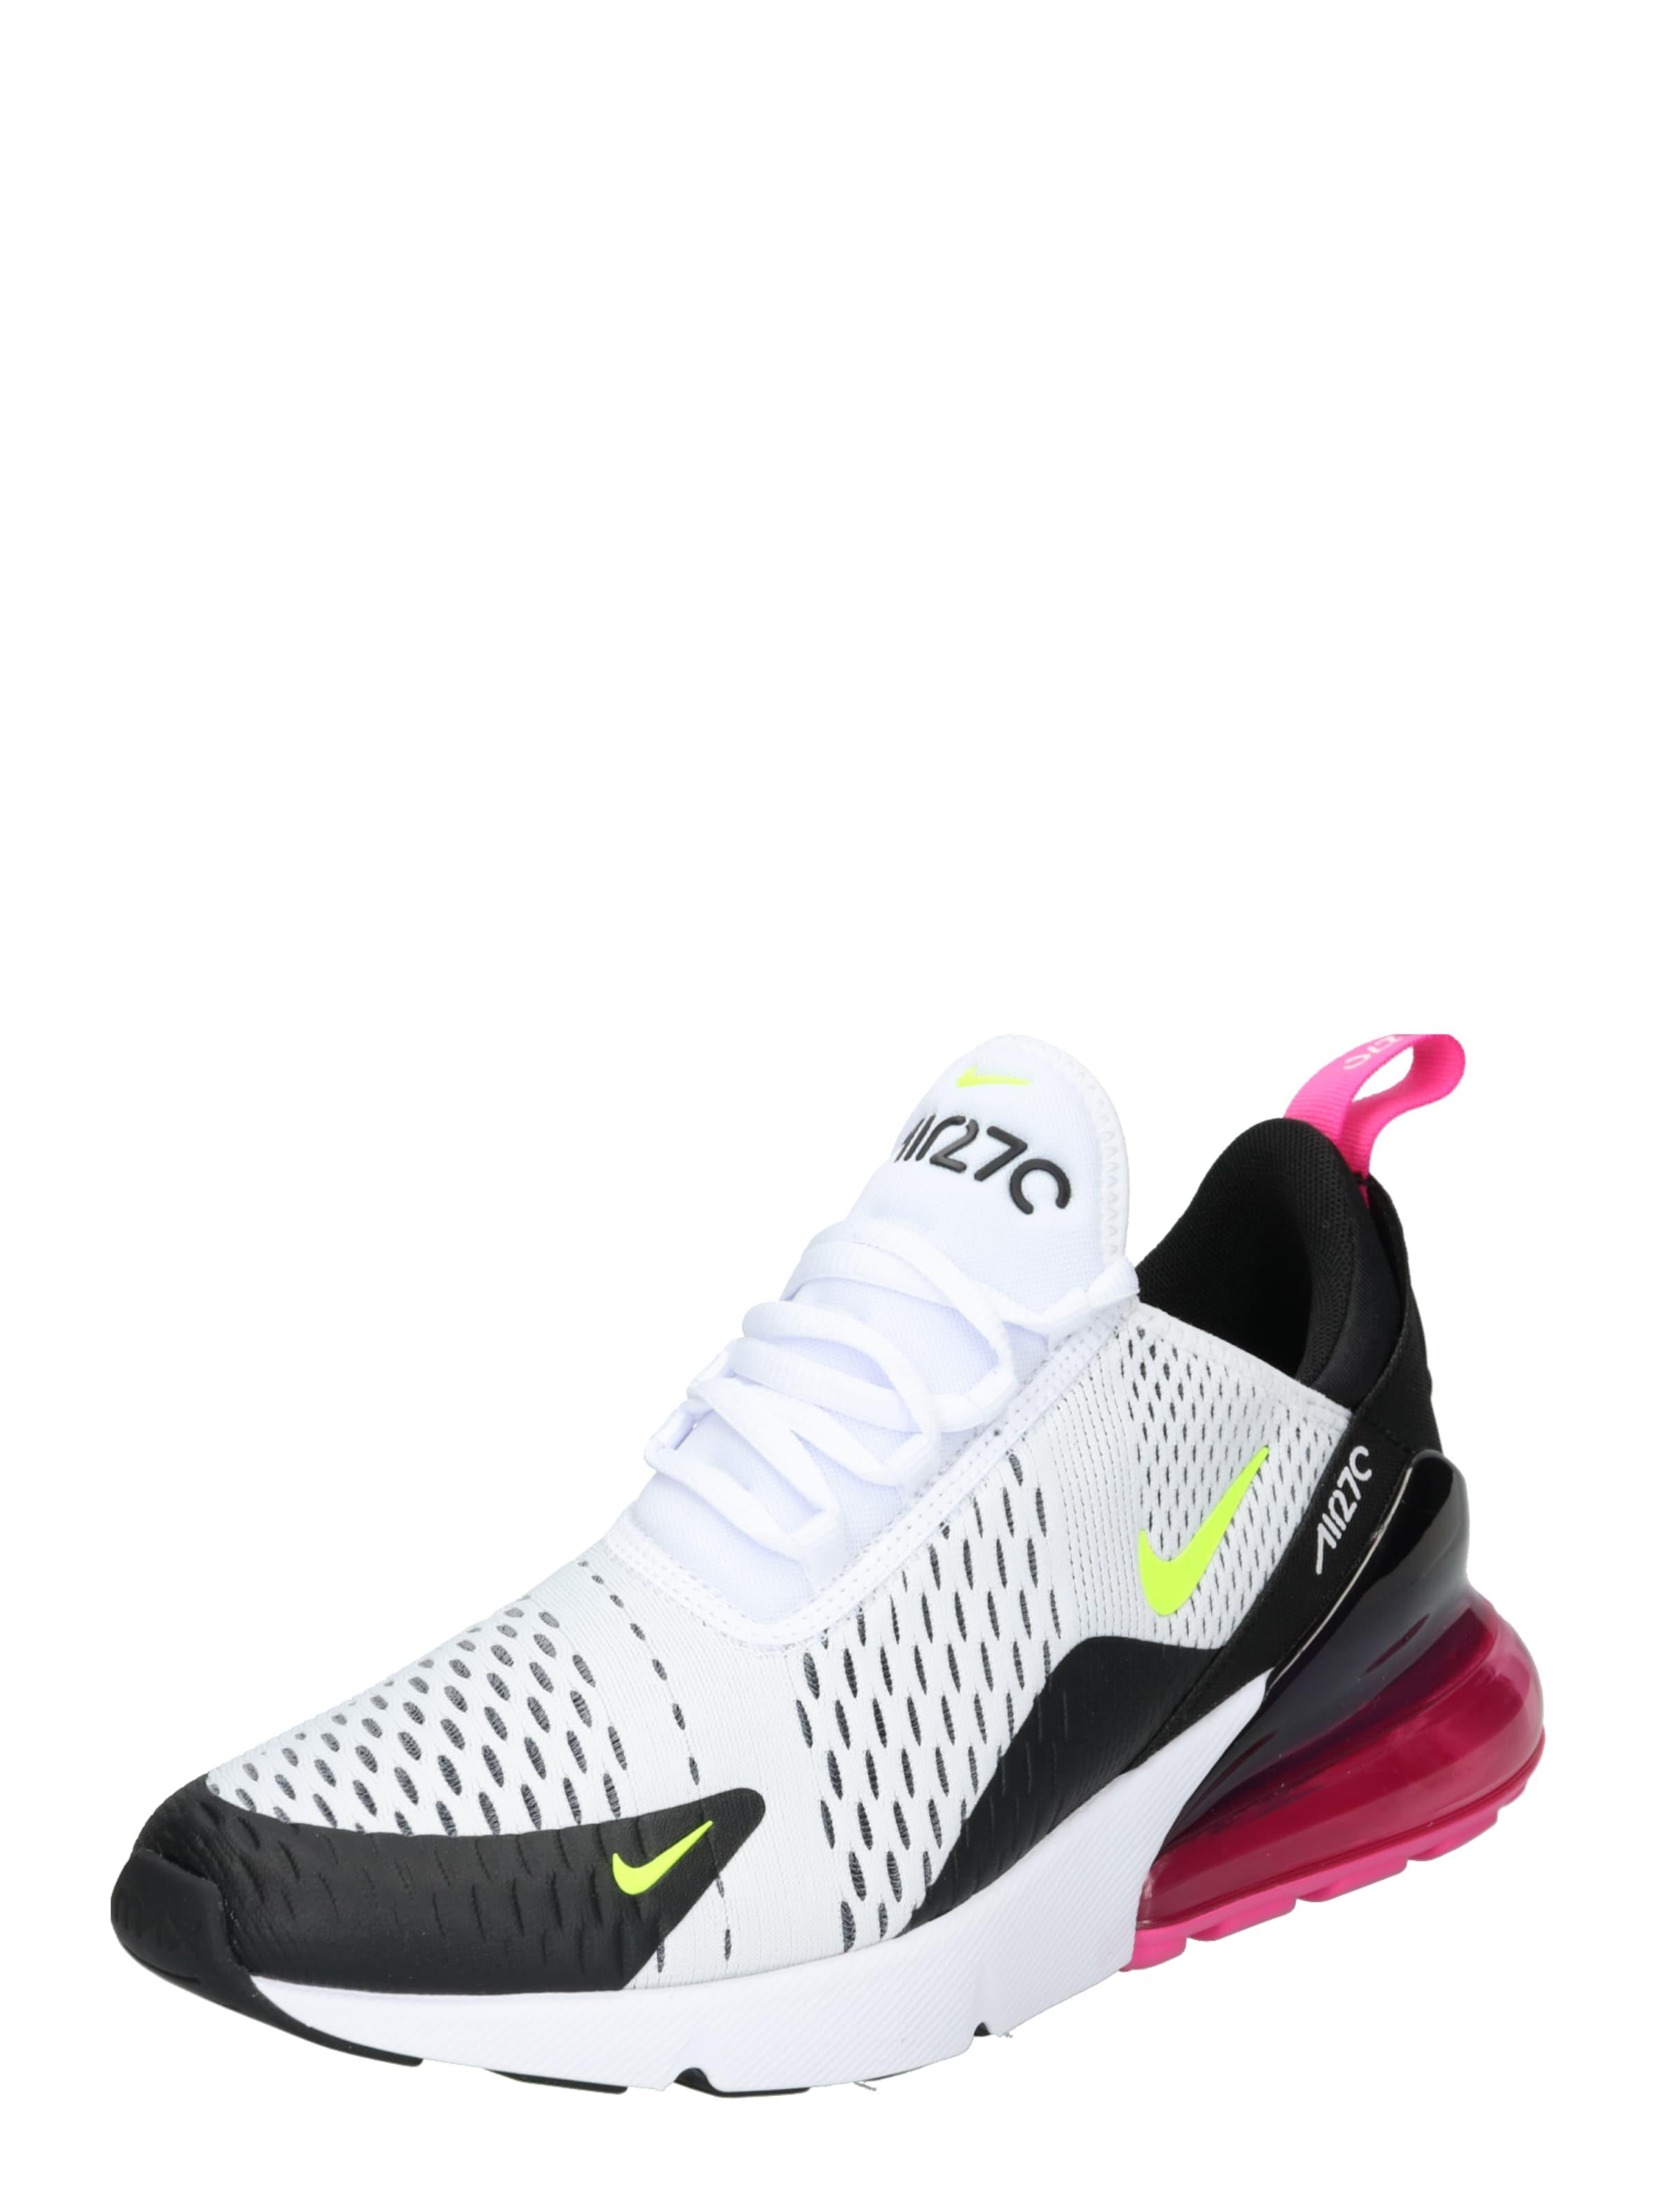 In Sneaker Max Weiß FuchsiaSchwarz Sportswear 270' Nike 'air IHE9D2